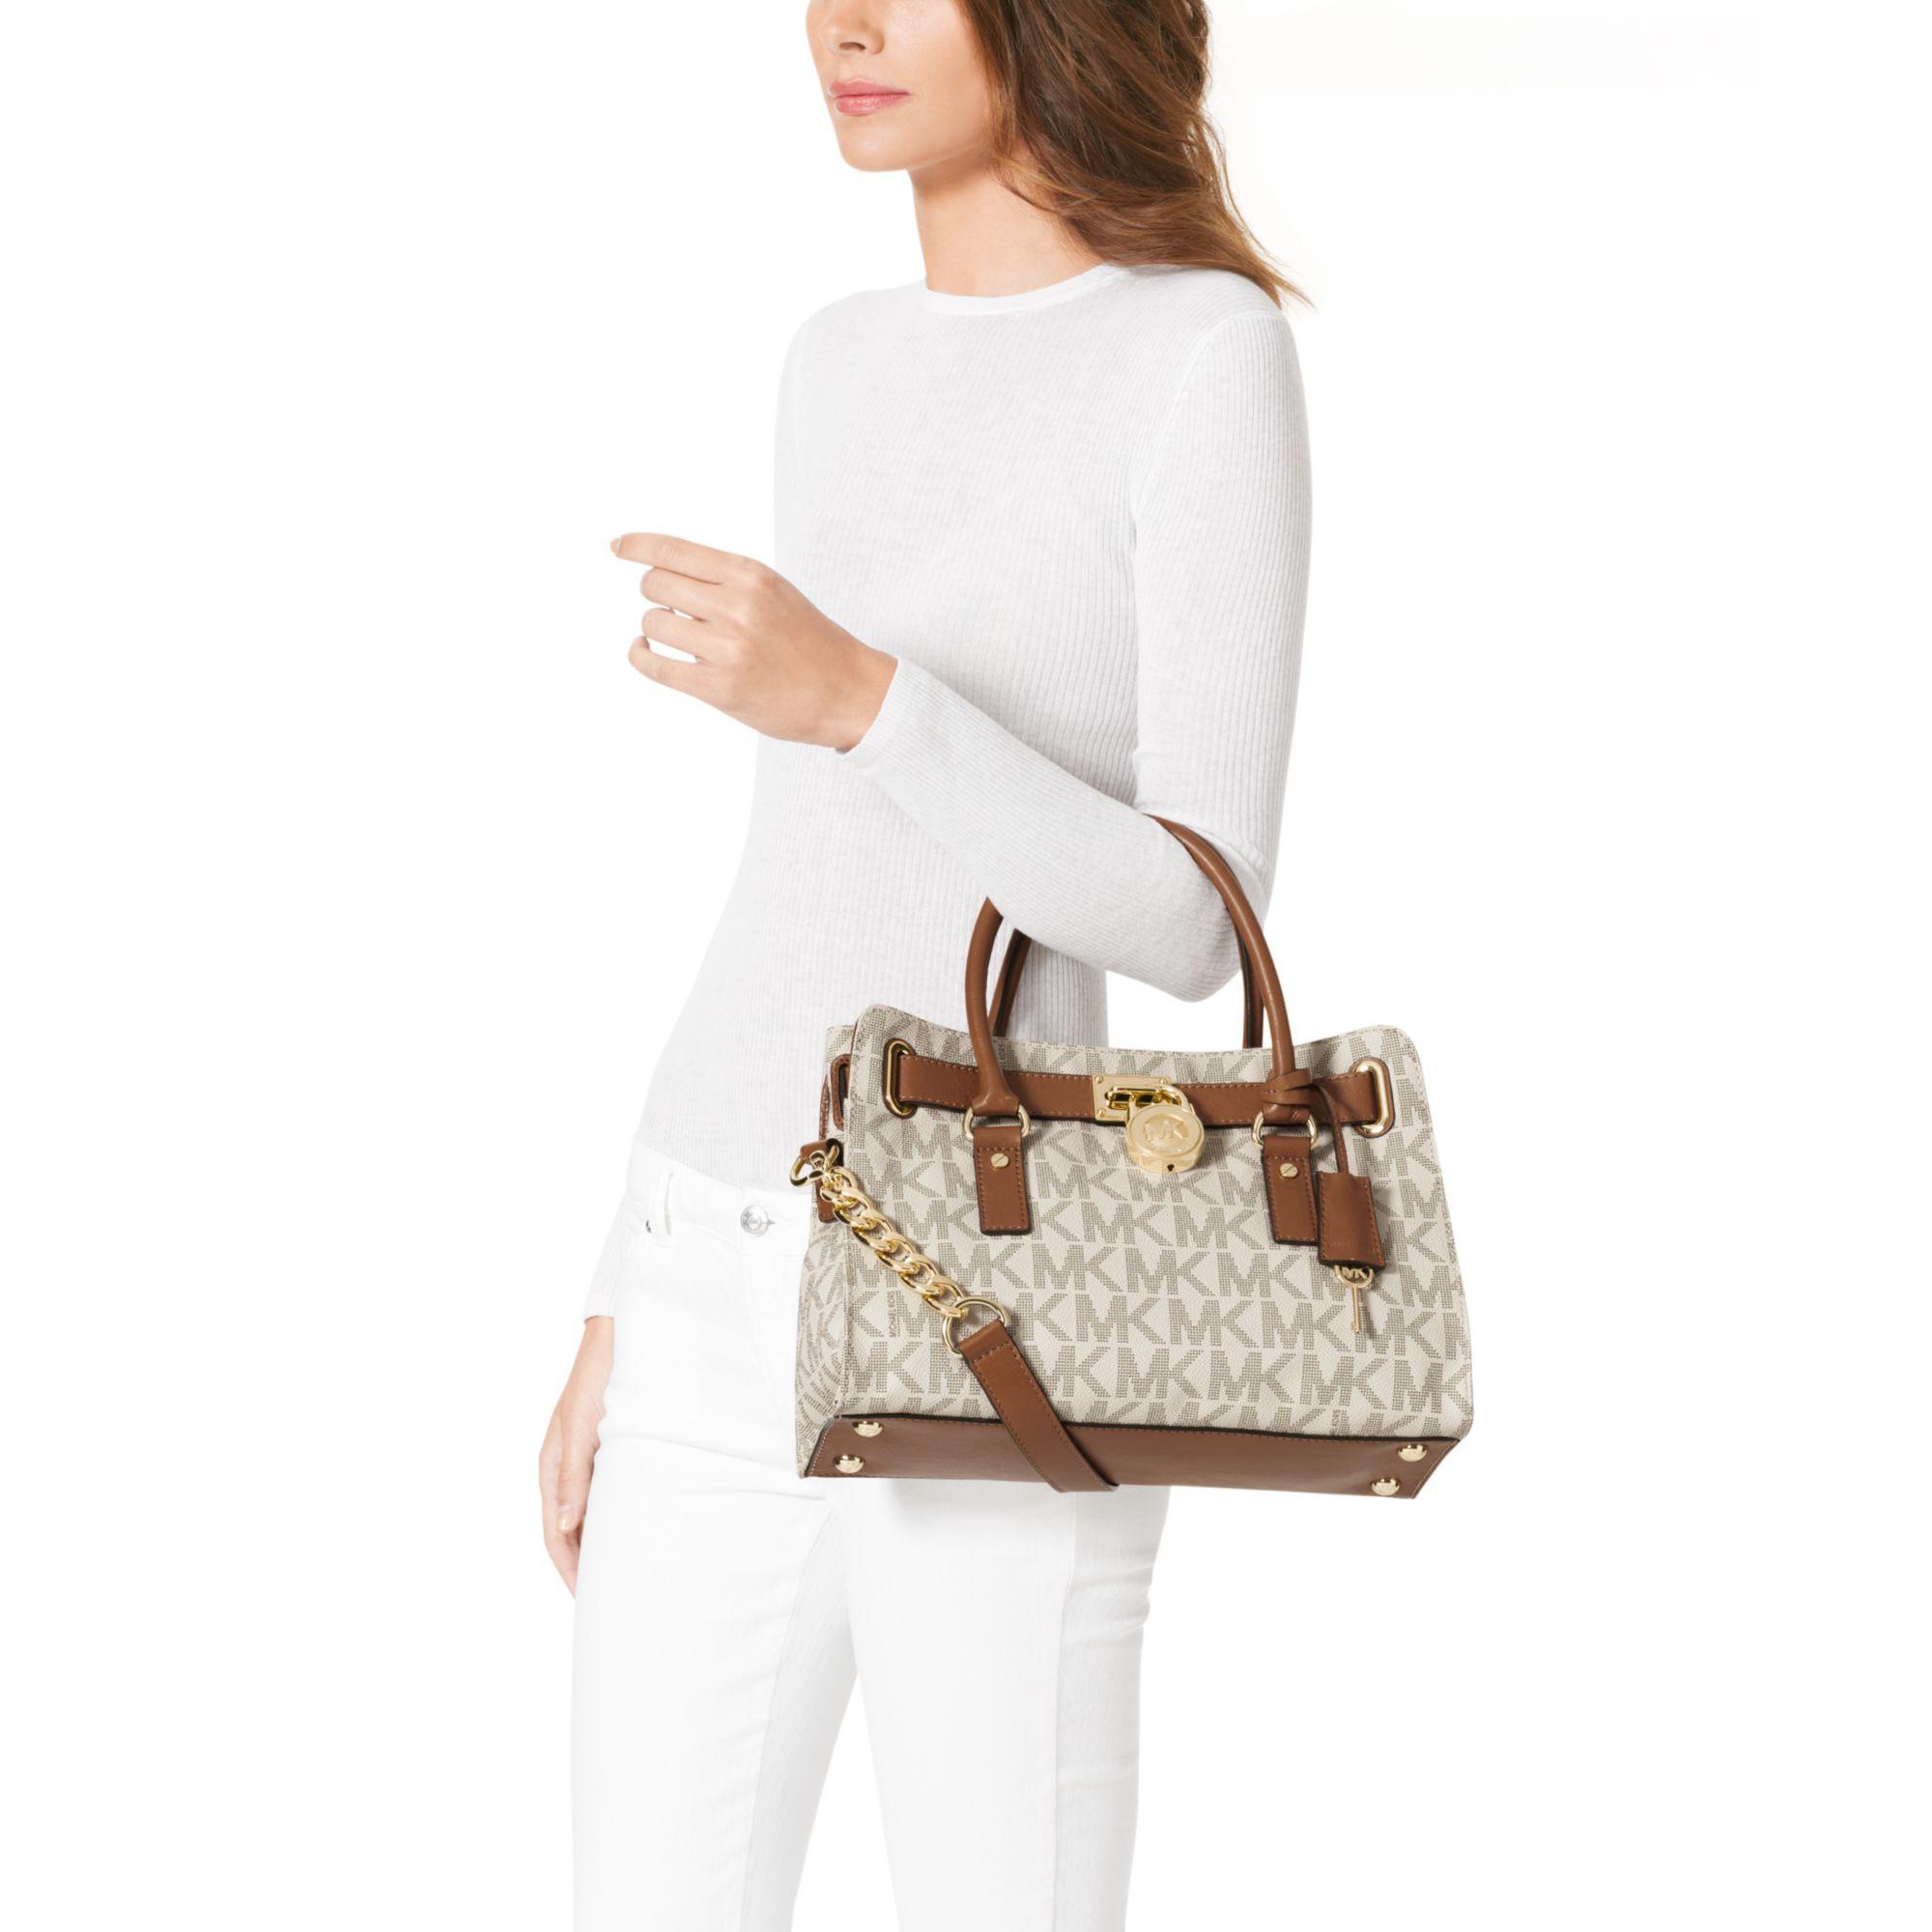 5c47d6ab8a3747 ... mk acorn mini crossbody. c8933 384be; cheap lyst michael kors hamilton  medium logo satchel in white 8de78 870ed